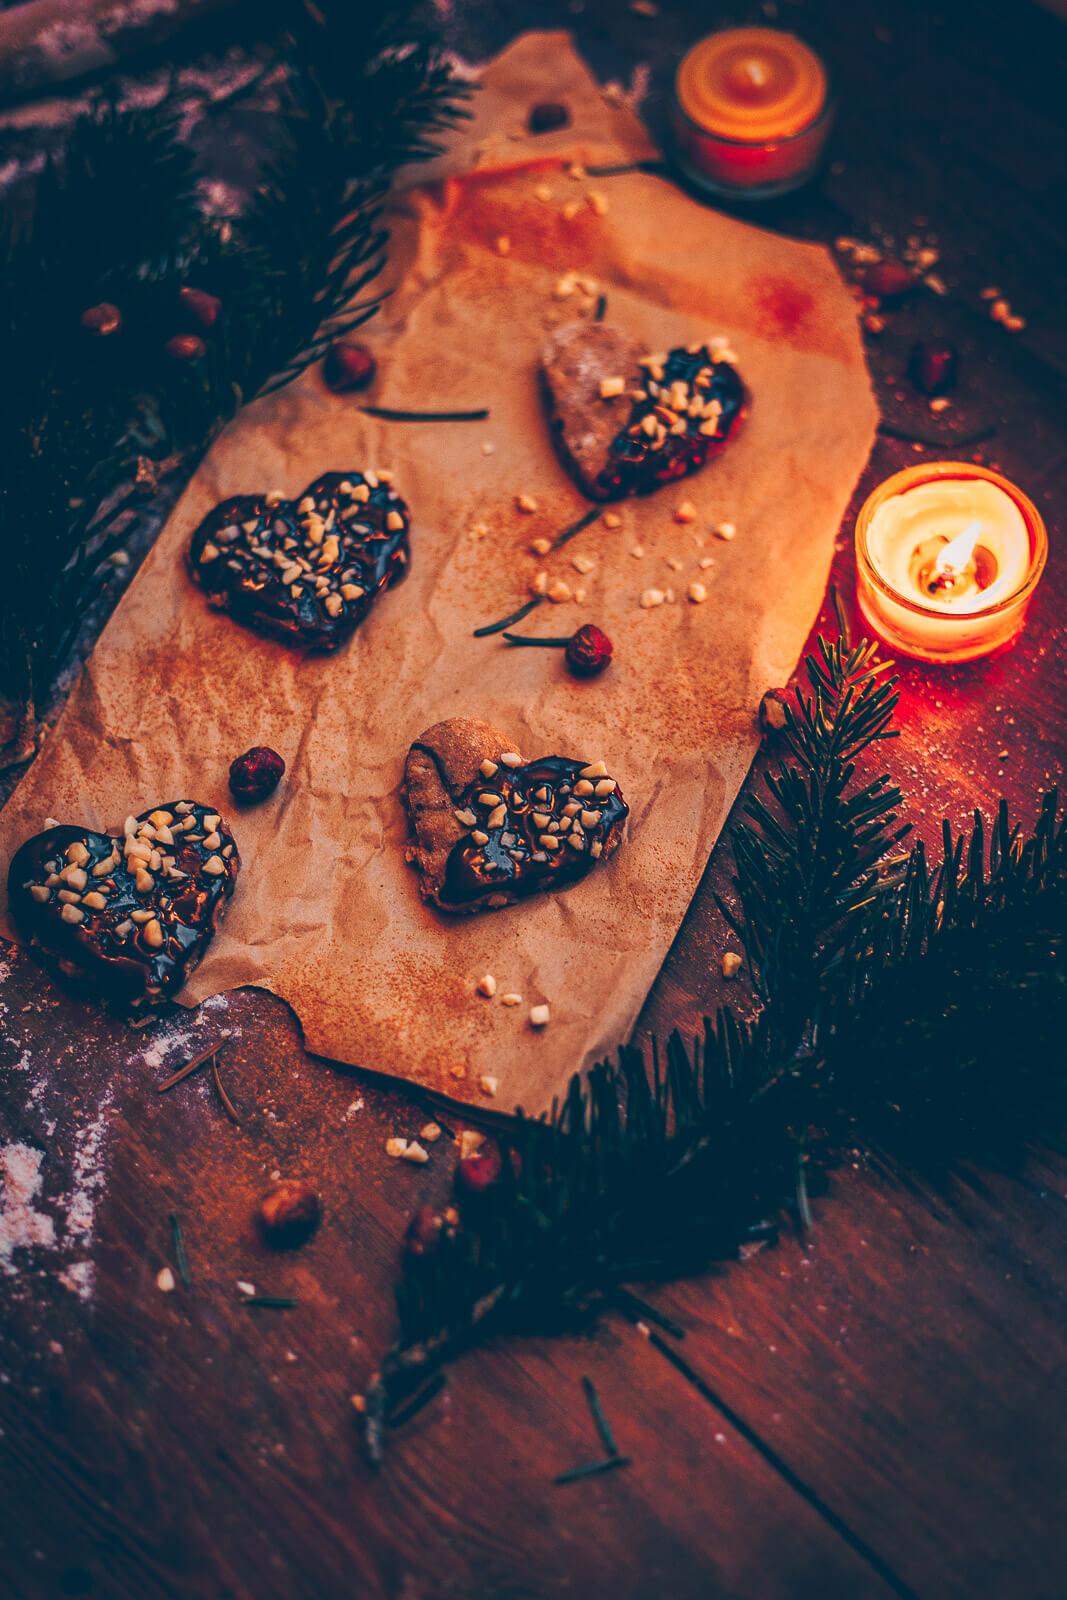 Haselnuss kekse, Haselnusskekse, Haselnuss-Ausstecherle, Haselnusskekse, Haselnuss Kekse vegan, vegan Ausstecherle, vegane Kekse, Kekse vegan Nuss, Nusskekse vegan, Nusskekse Haselnuss, Cookies Weihnachten vegan, Weihnachtskekse vegan, Weihnachtskekse mit Nuss, nussige Kekse, Weihnachtskekse vegan Haselnuss